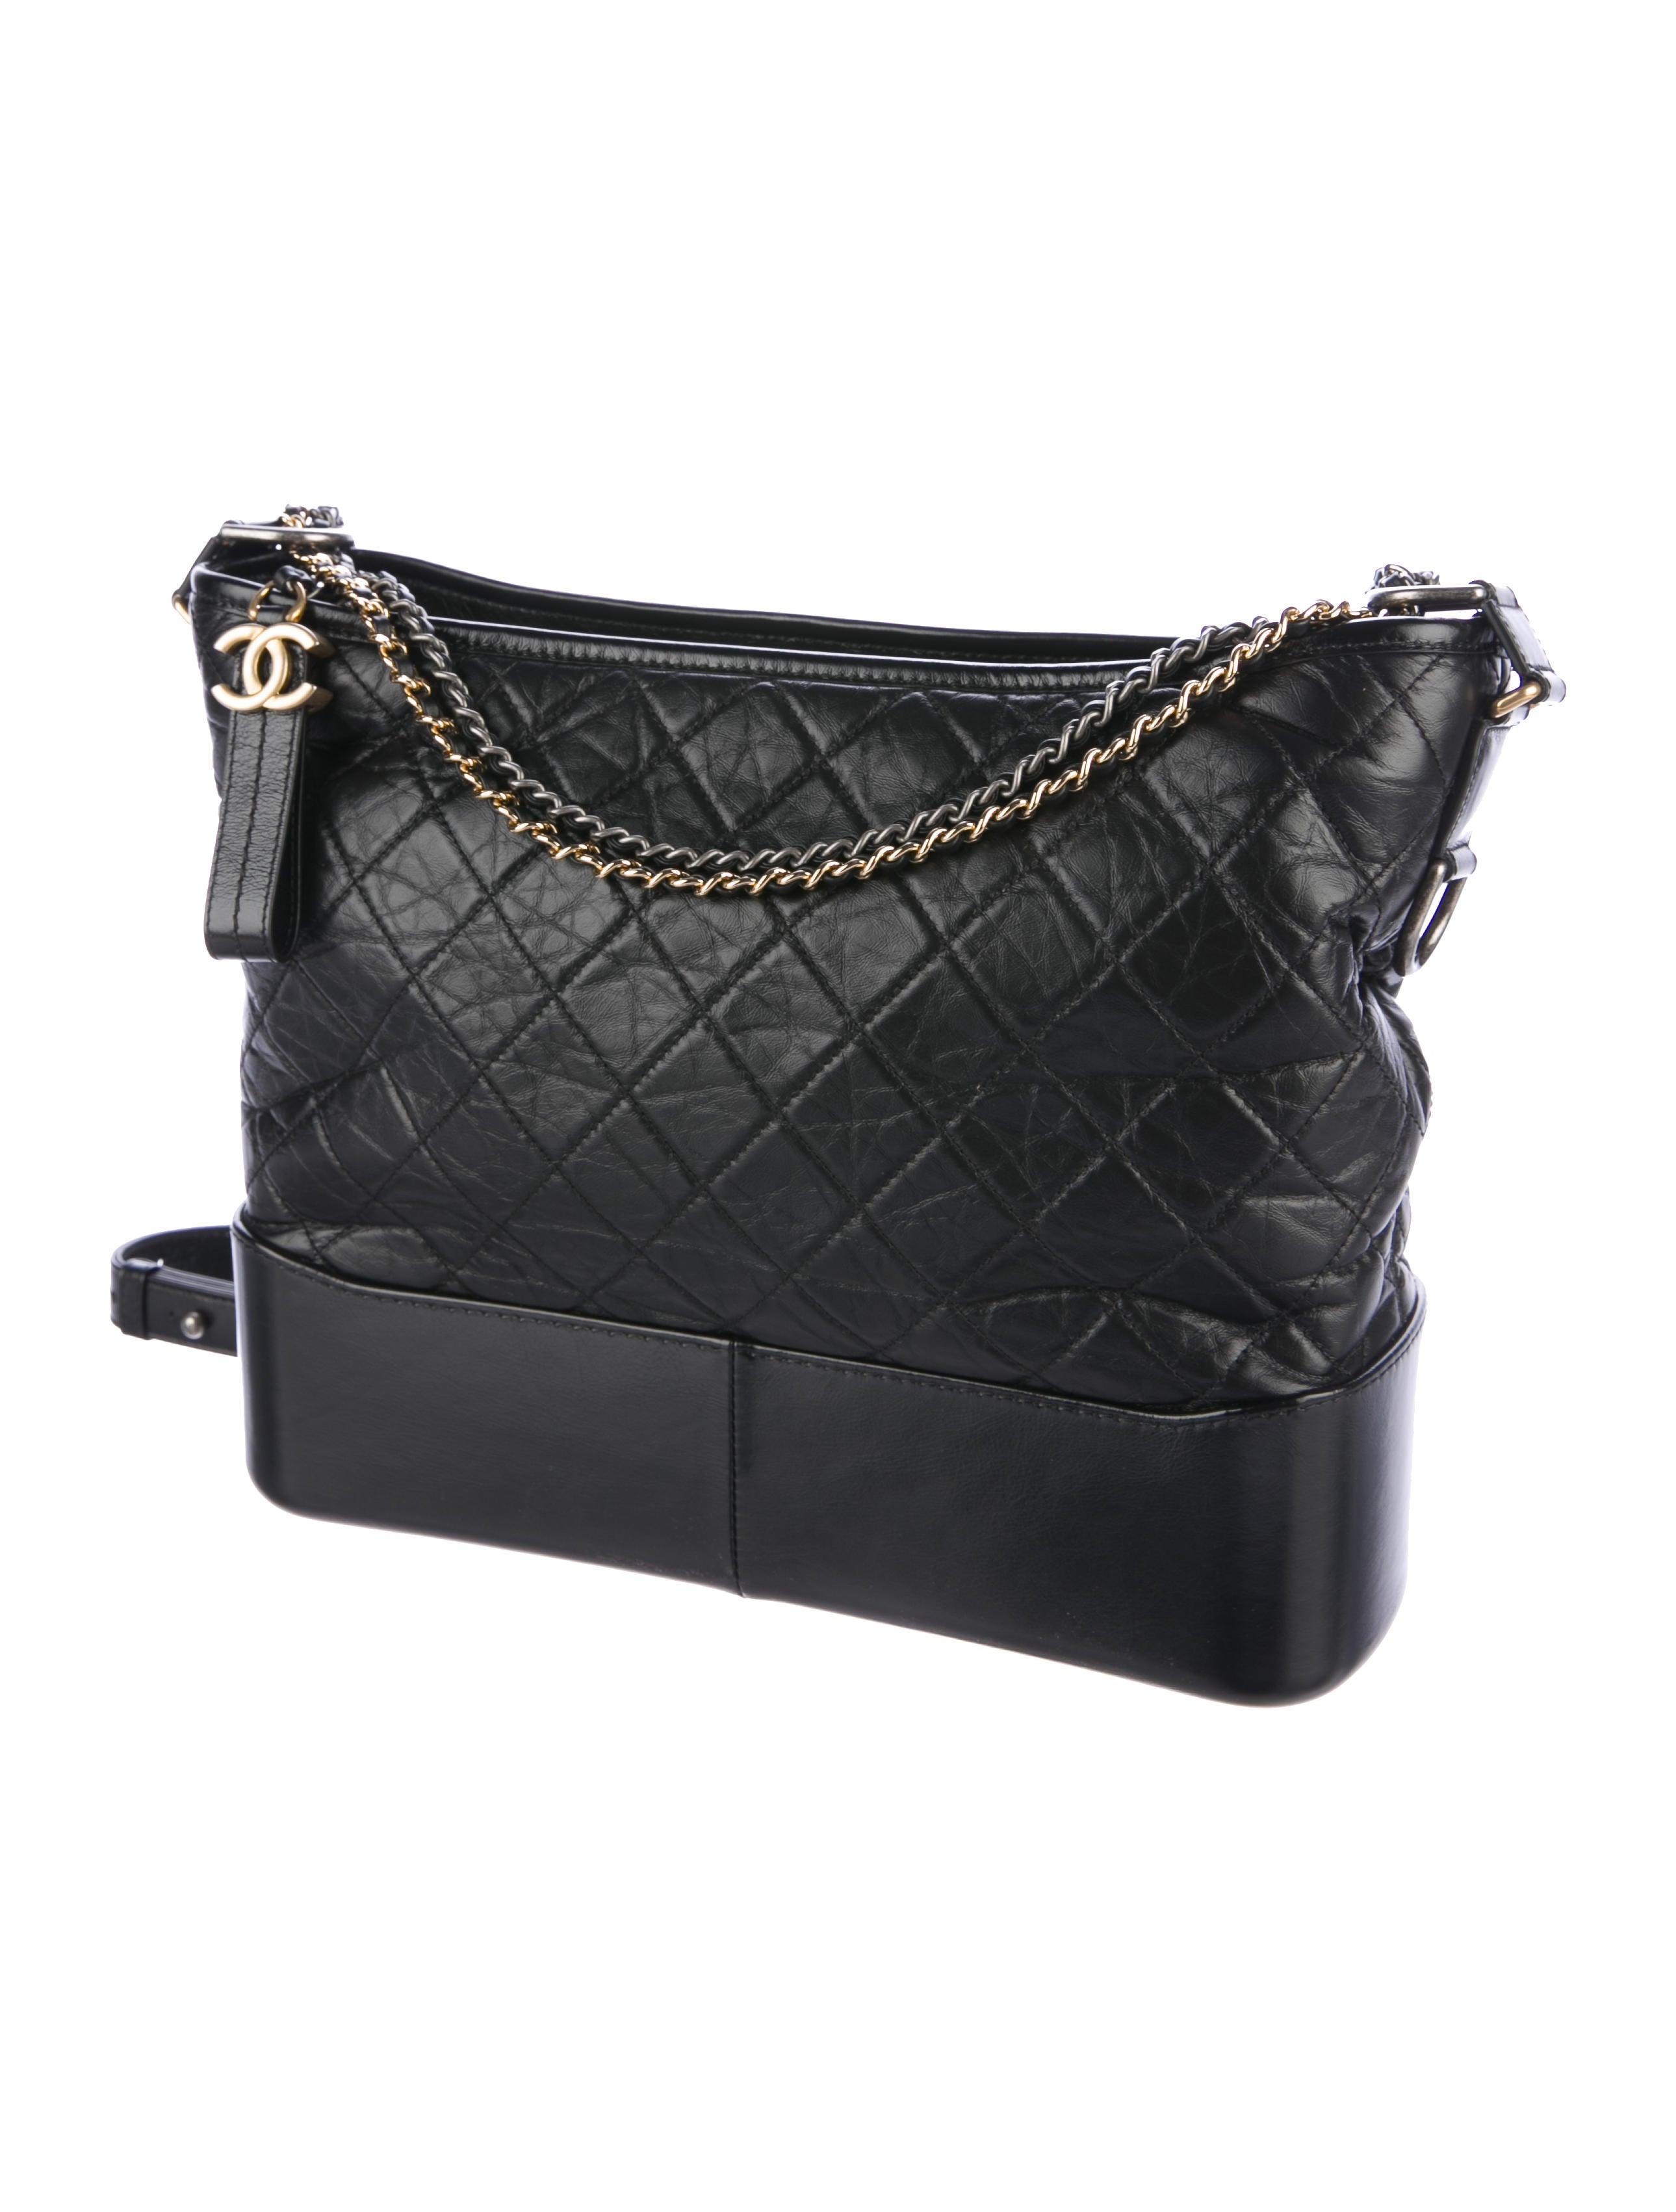 5ab908071a32 Chanel 2017 Large Gabrielle Hobo - Handbags - CHA195382 | The RealReal